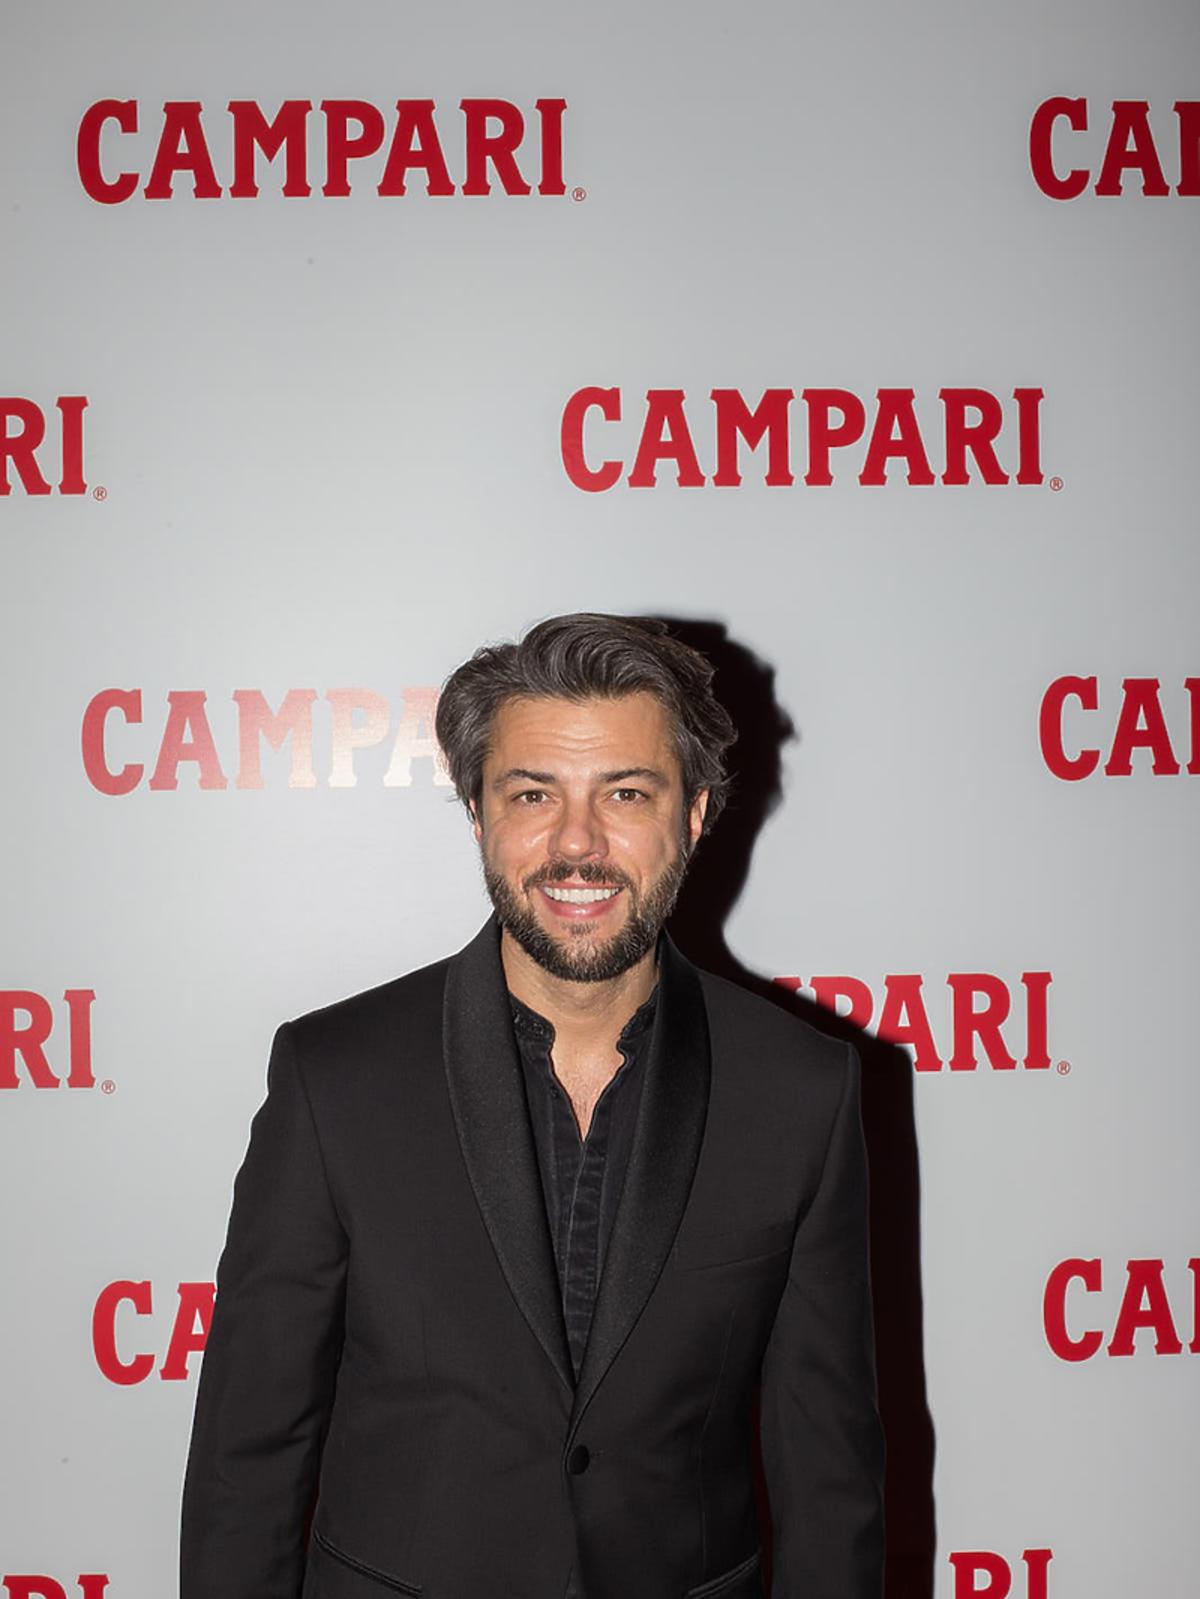 Otwarcie Pop Up Bar Campari  - Olivier Janiak